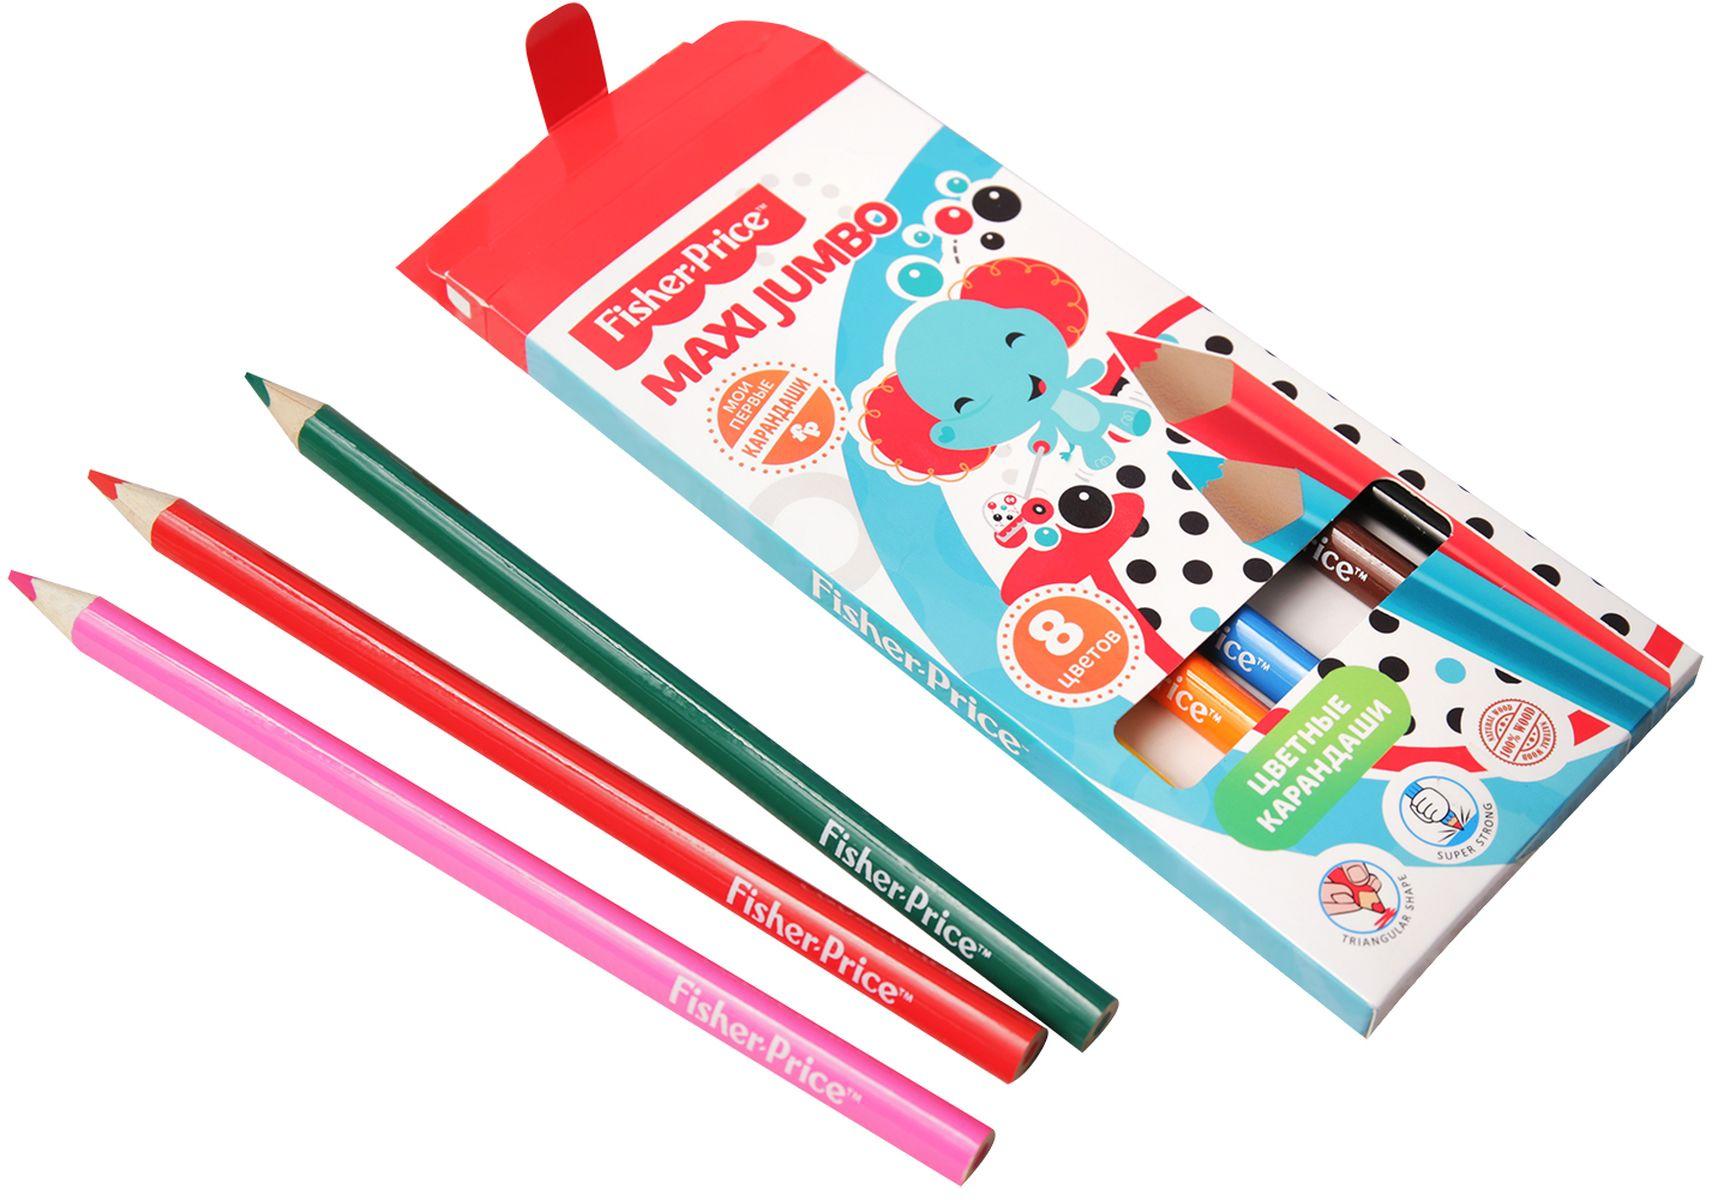 Mattel Набор цветных карандашей Maxi Jumbo Mattel Fisher Price 8 цветов mattel набор фигурок fisher price shimmer